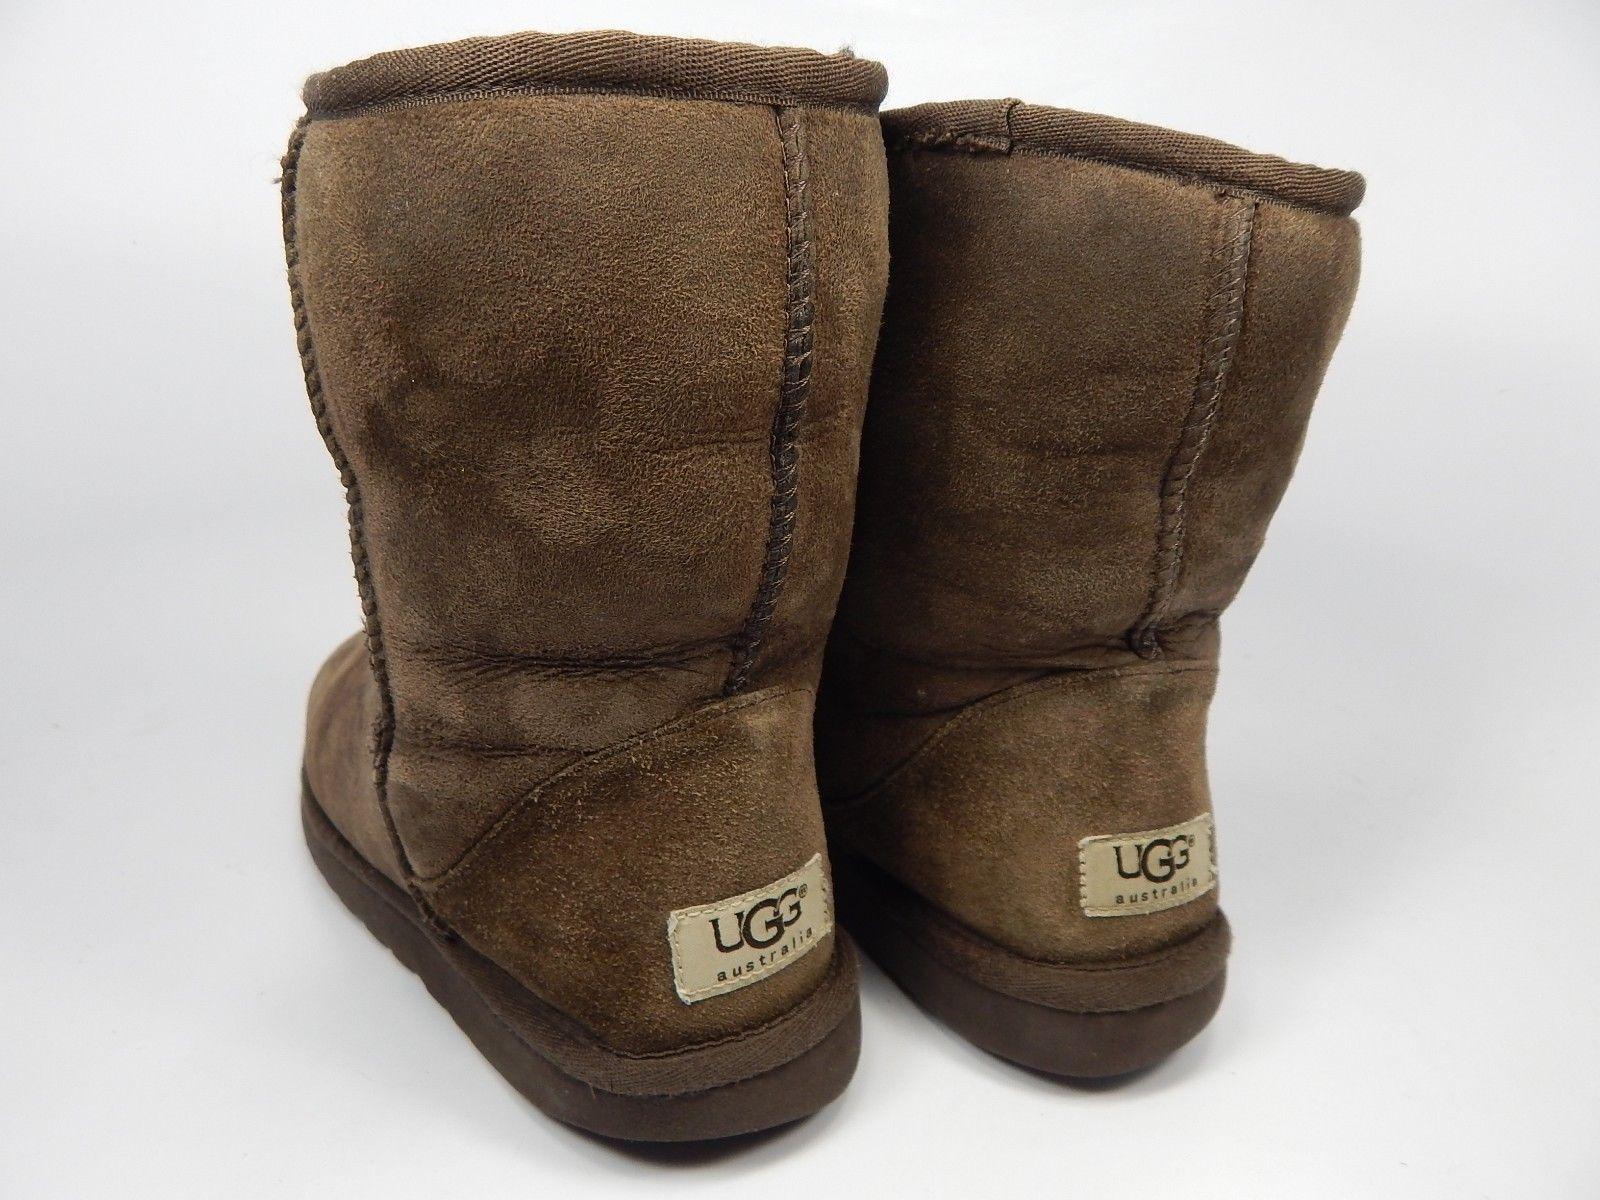 abd0c55b167 UGG Australia Classic Short Sheepskin Brown and 50 similar items